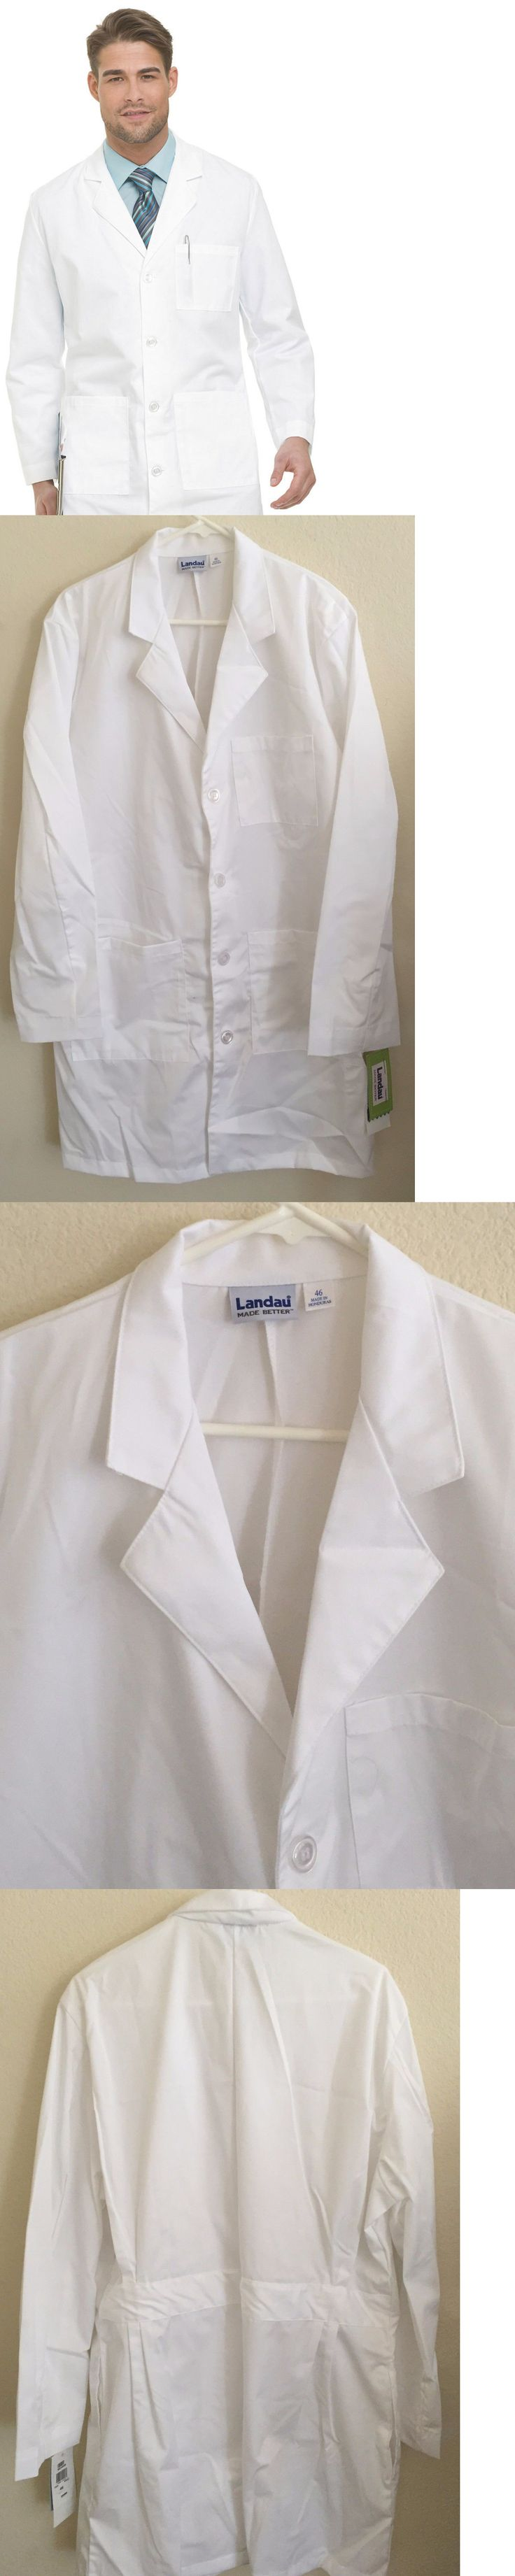 Lab Coats 105417: Landau Men S 4 Button Long Sleeve White Scrub Lab Coat Wwvc Size 46 -> BUY IT NOW ONLY: $30 on eBay!